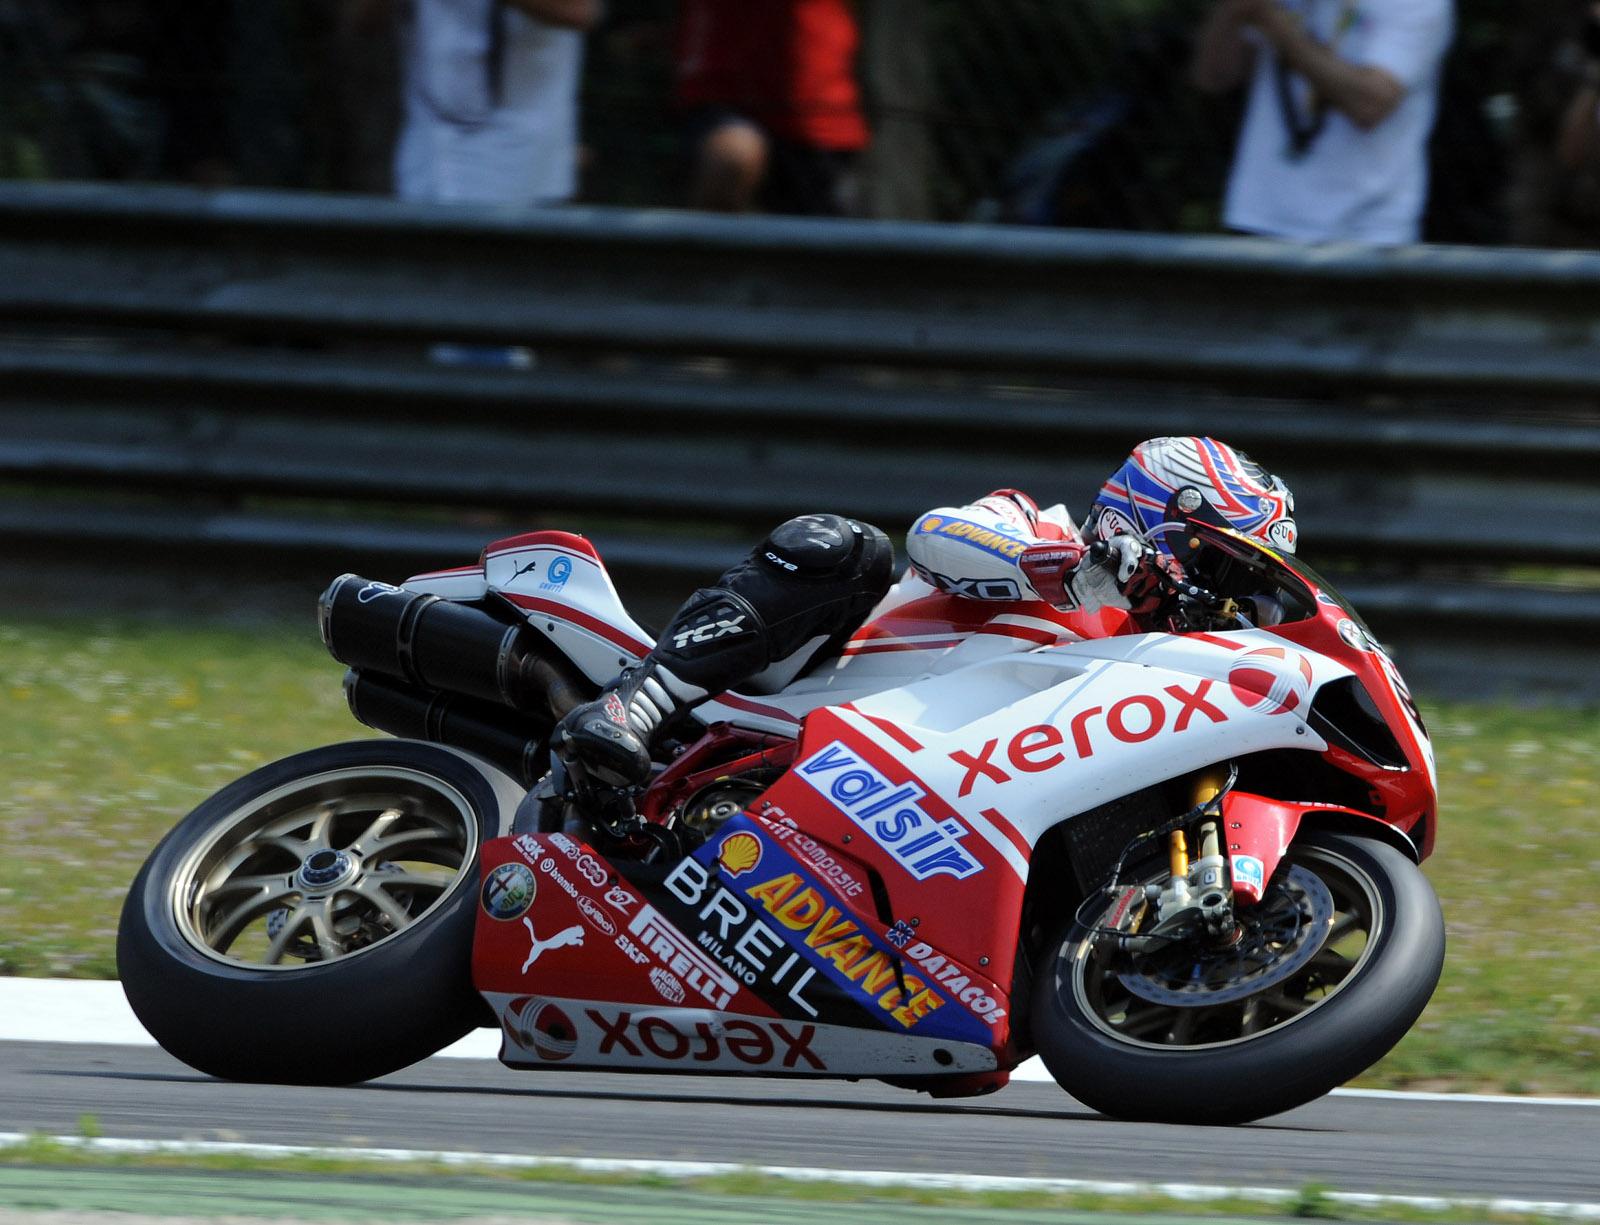 Troy Bayliss and Michel Fabrizio  Ducati Xerox World Superbike Team